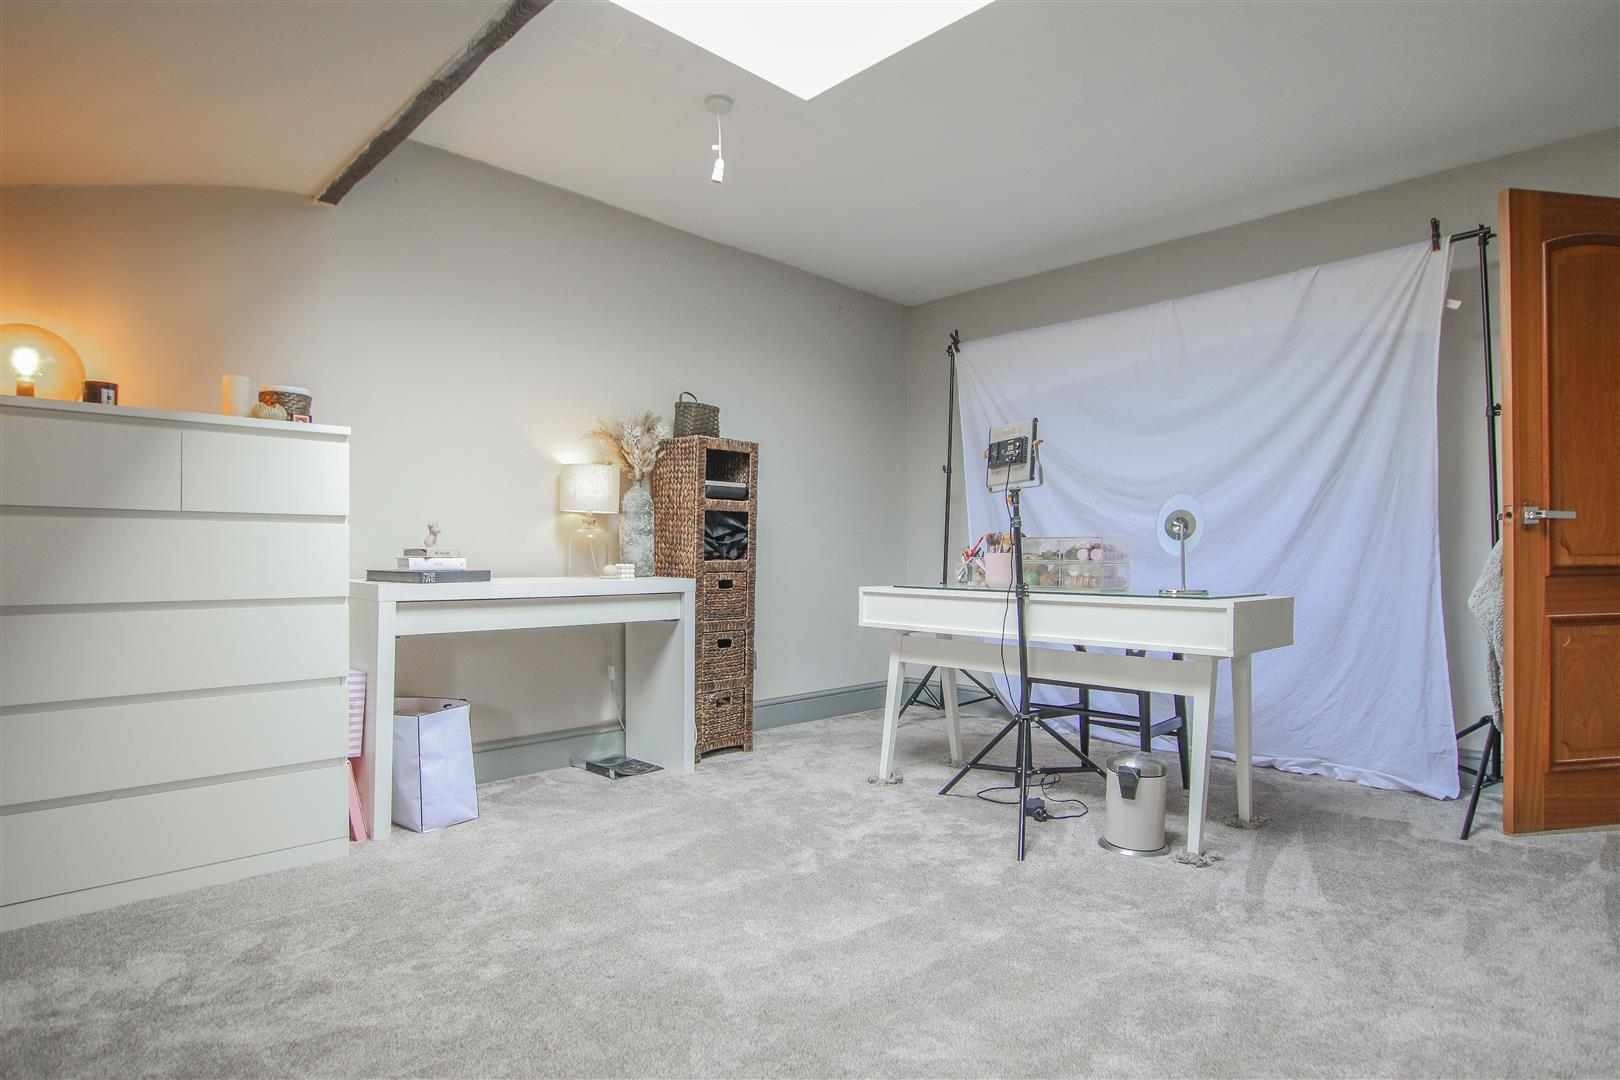 6 Bedroom Barn Conversion For Sale - 48.JPG